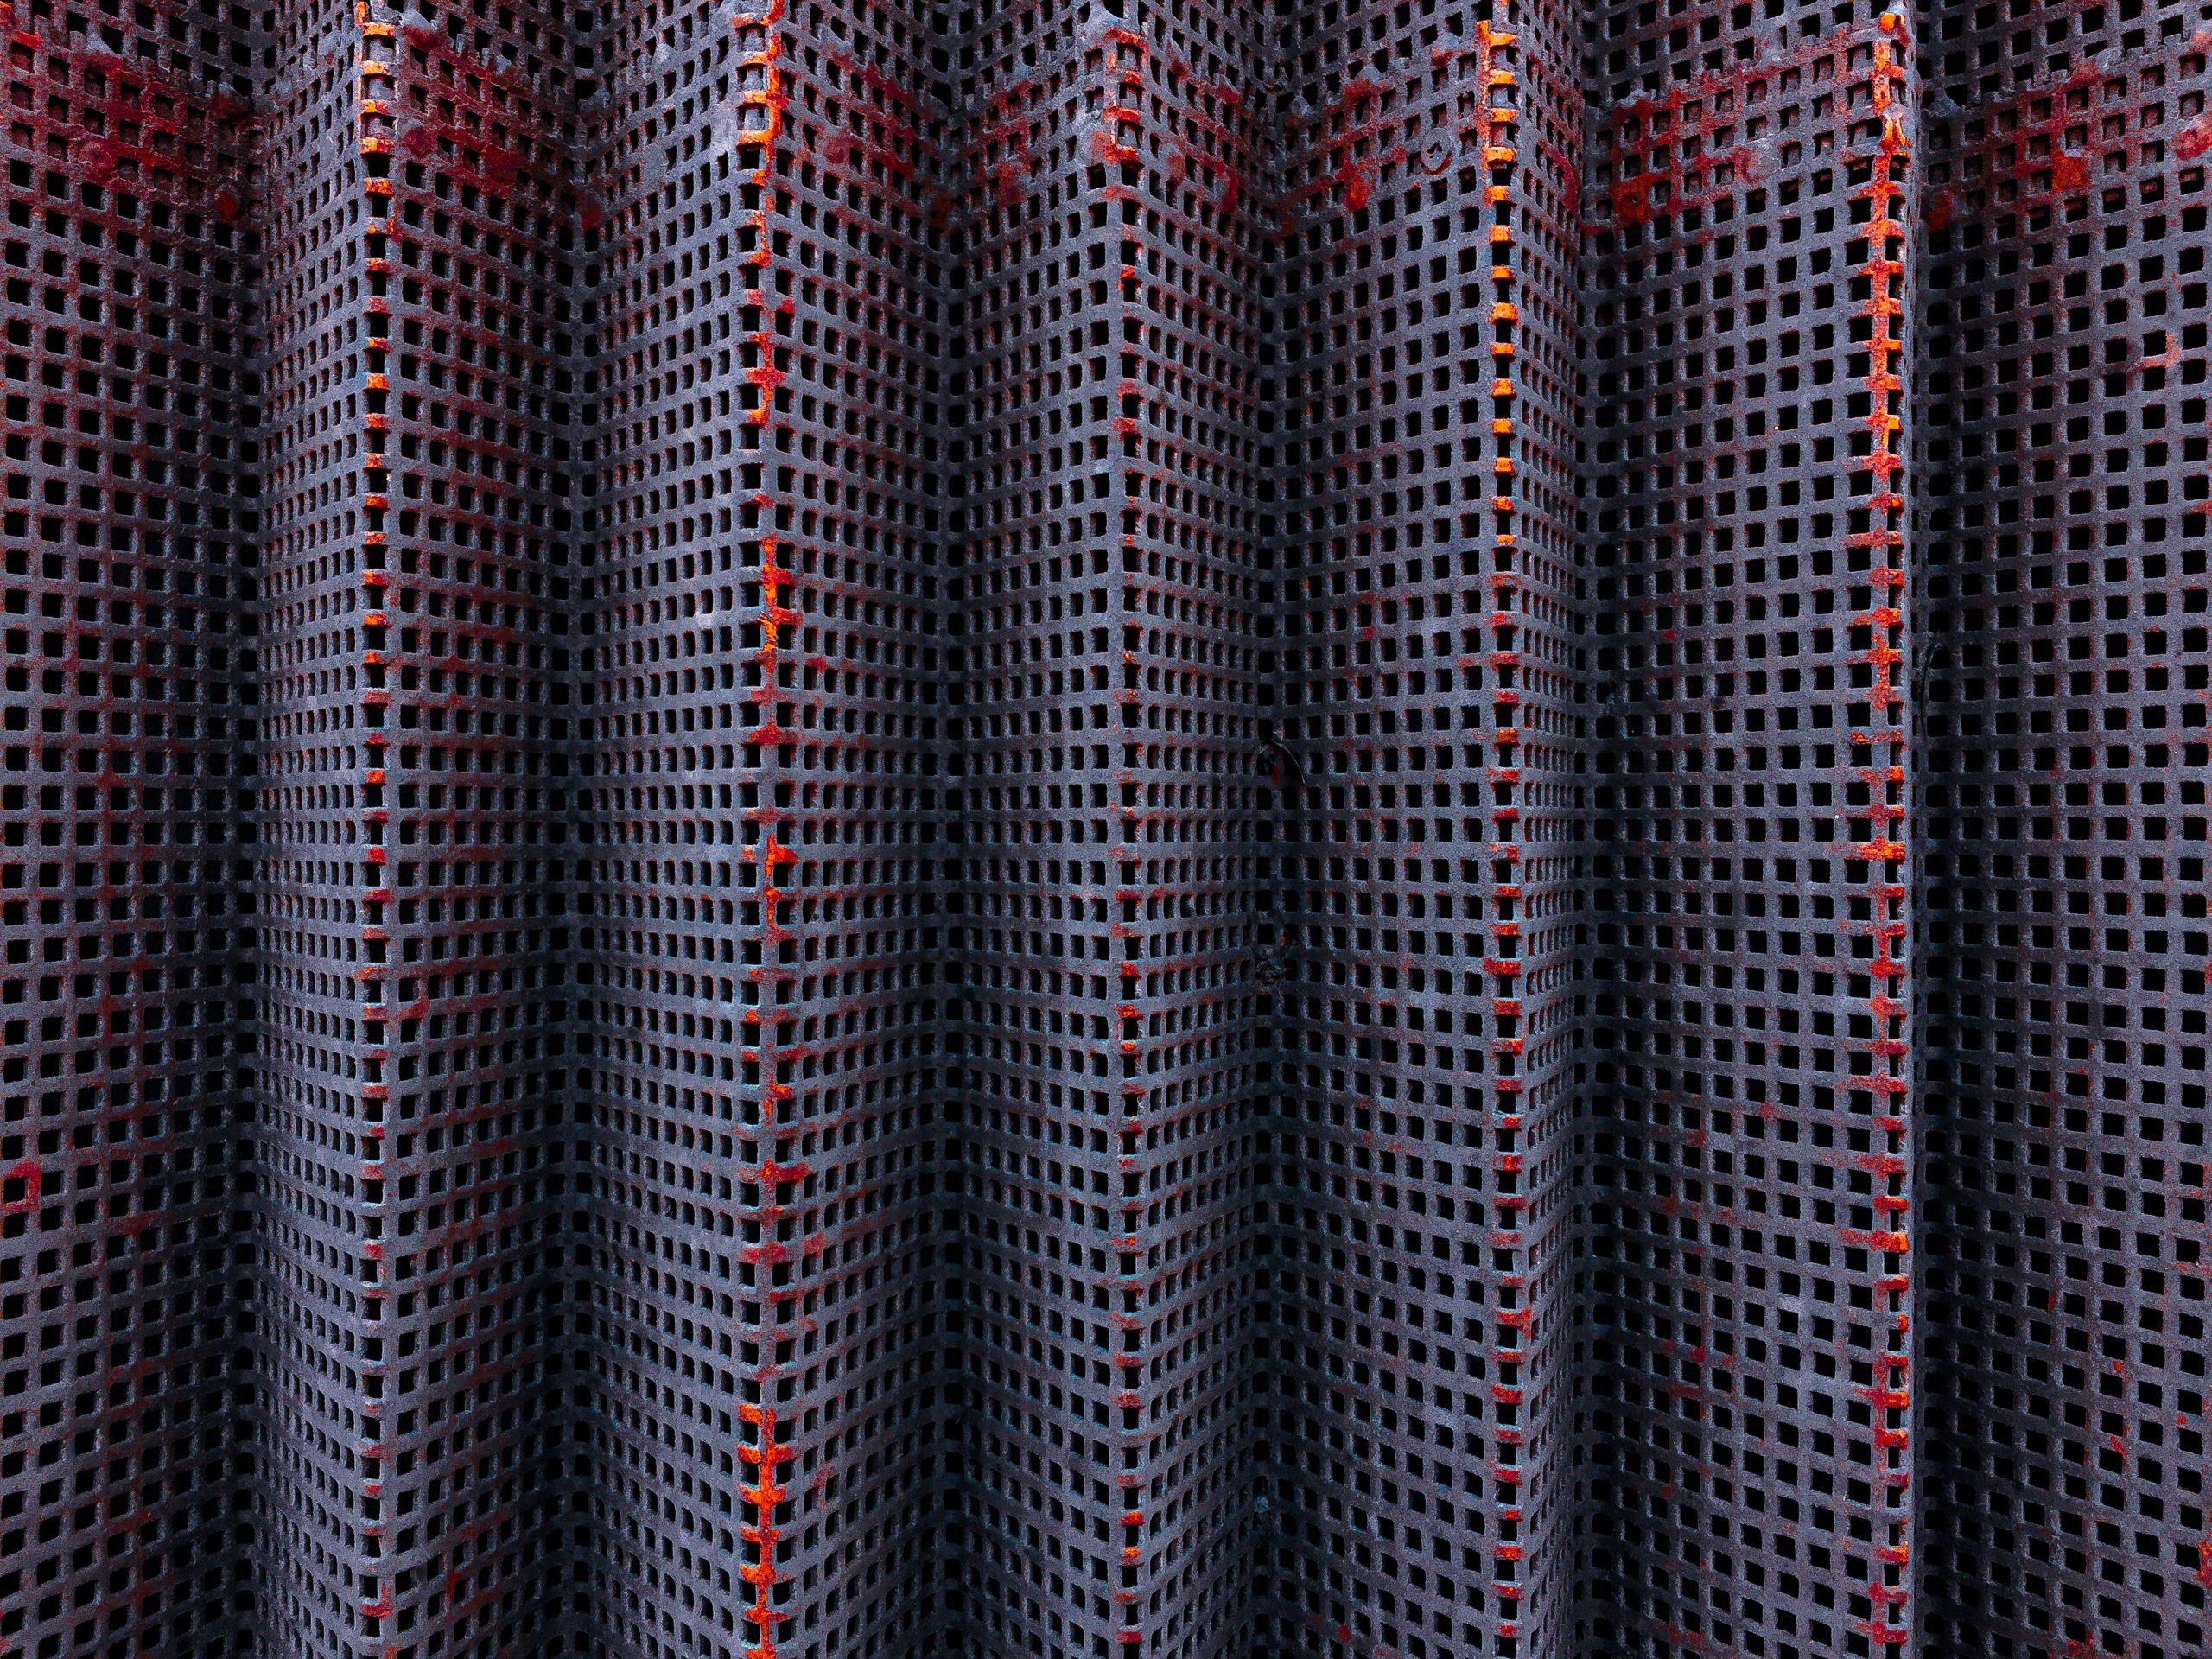 A wire mesh net